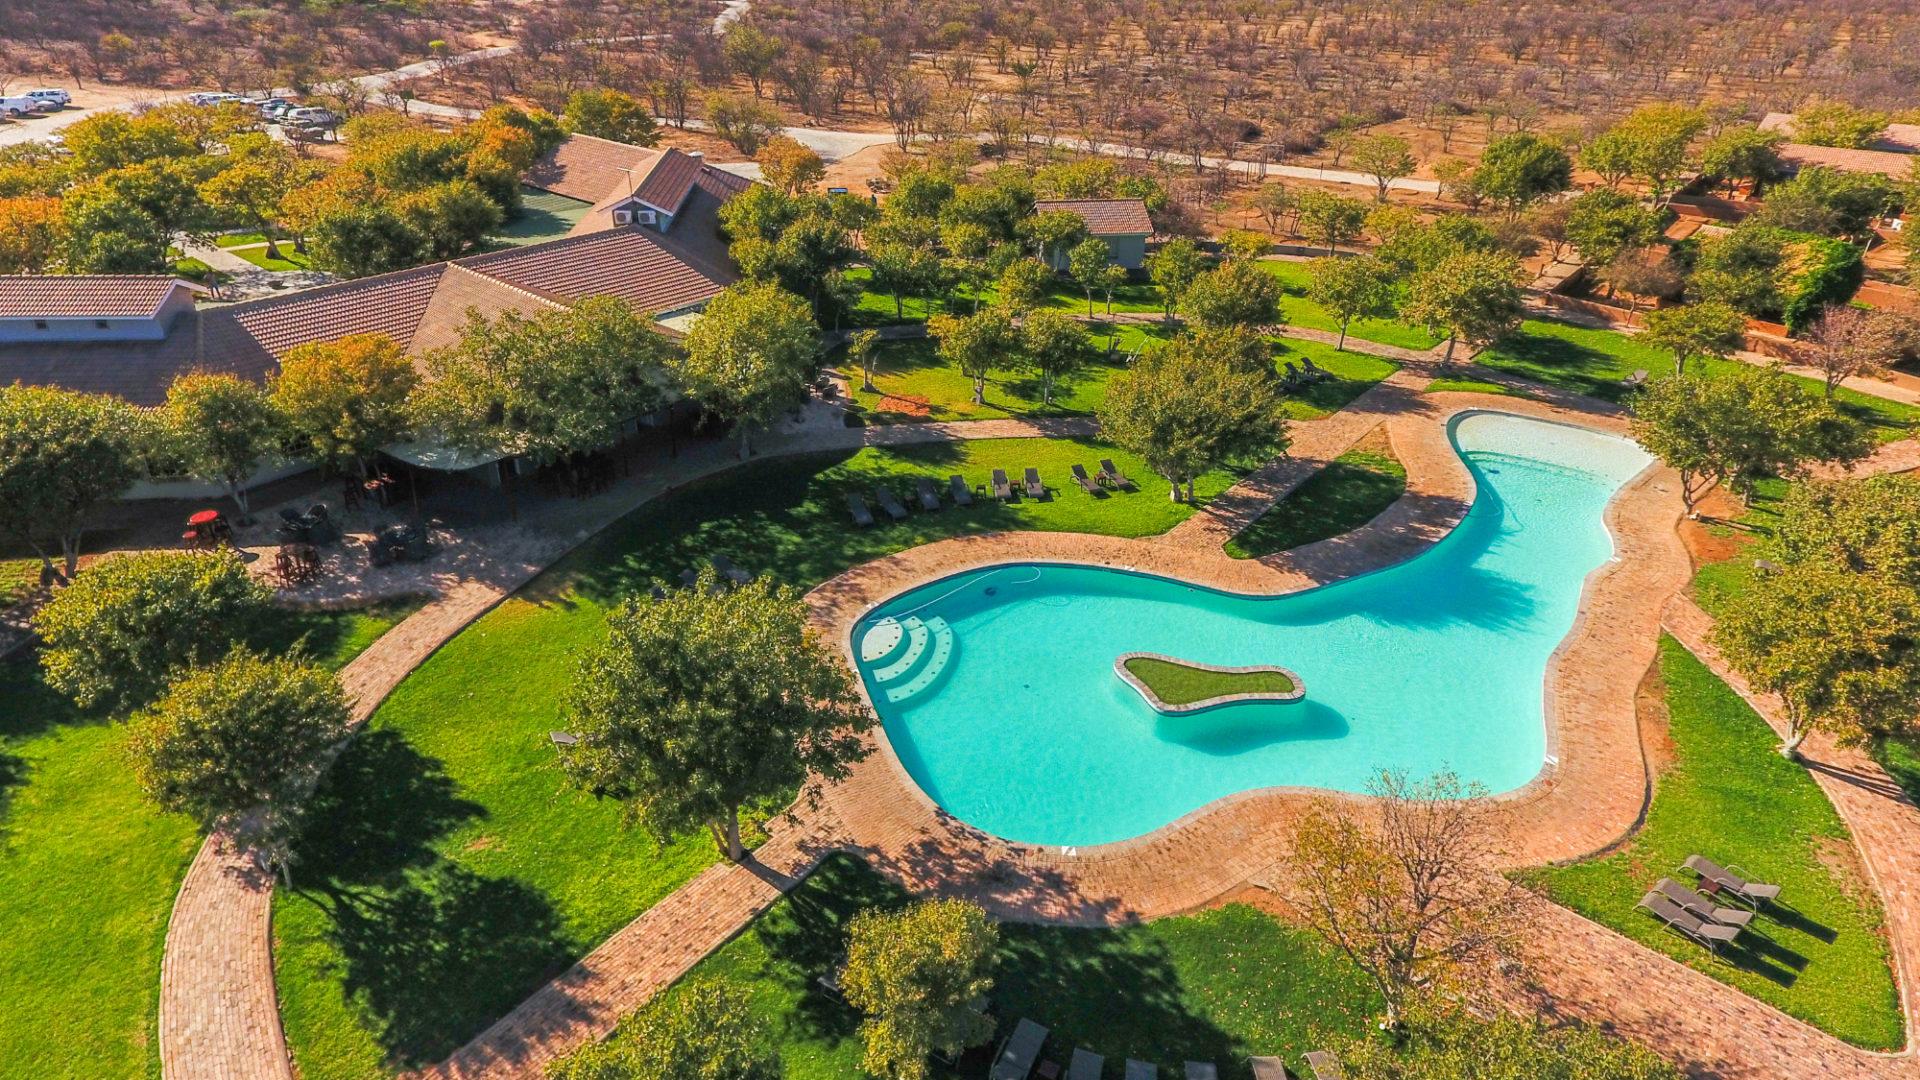 Namibia - 1552 - Damaland - Damara Mopani Lodge - Swimming Pool